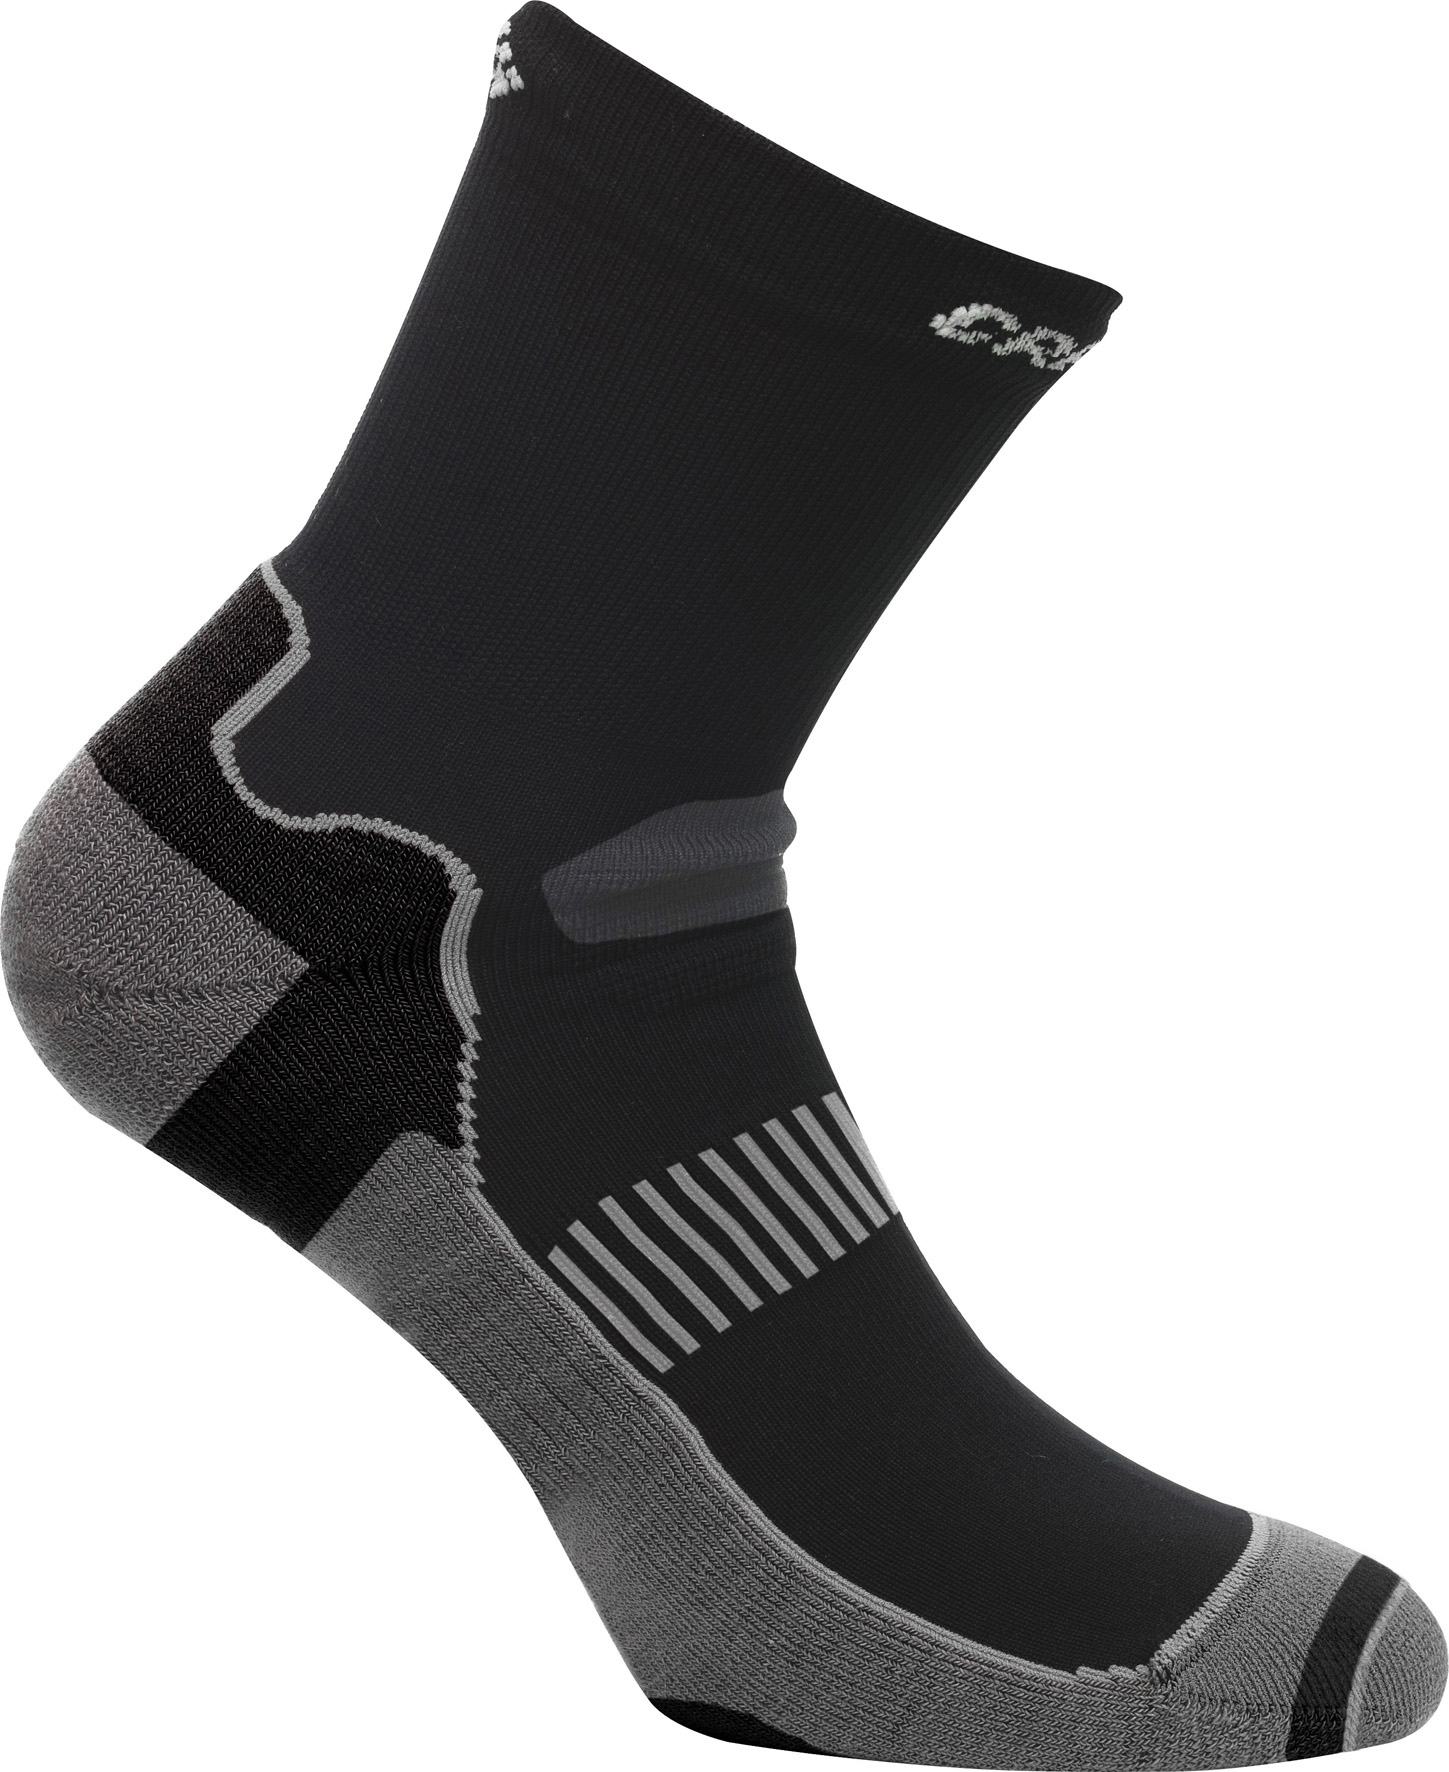 Носки Craft Basic 2-Pack Warm 2 Пары черные (1900747-2900)